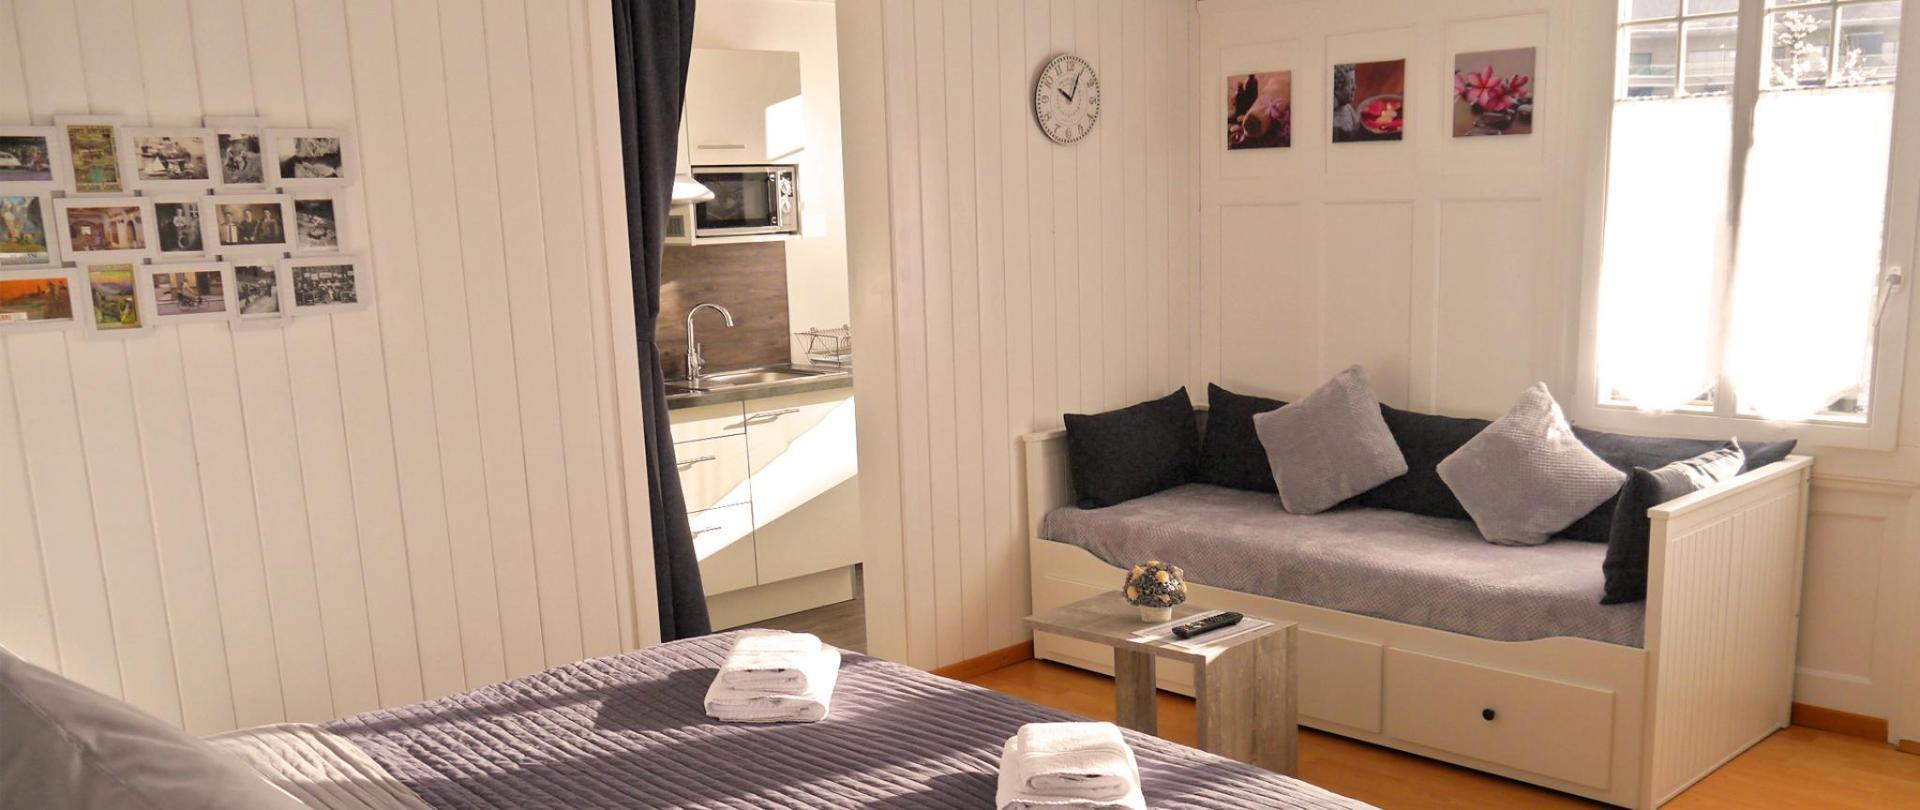 Apartment III 8.jpg